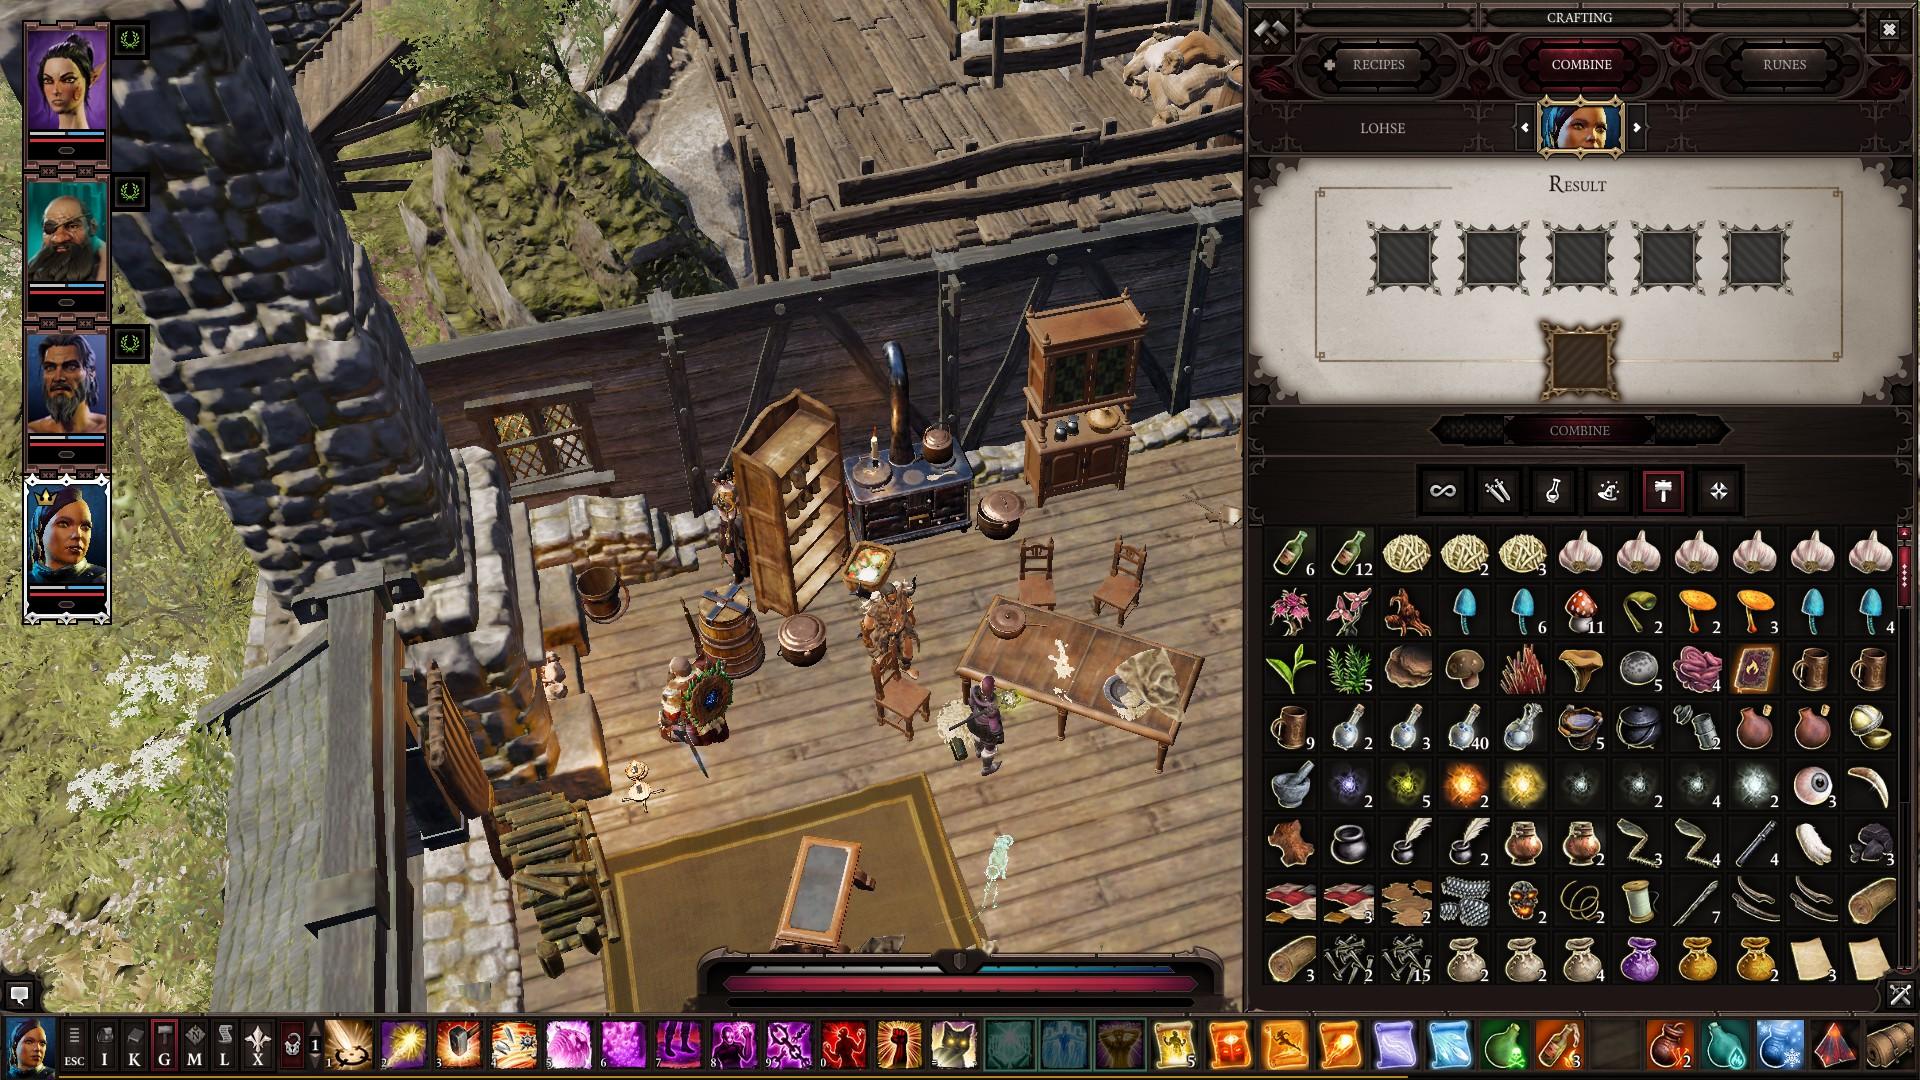 Cộng đồng Steam :: Hướng dẫn :: Top Tips for Beginners